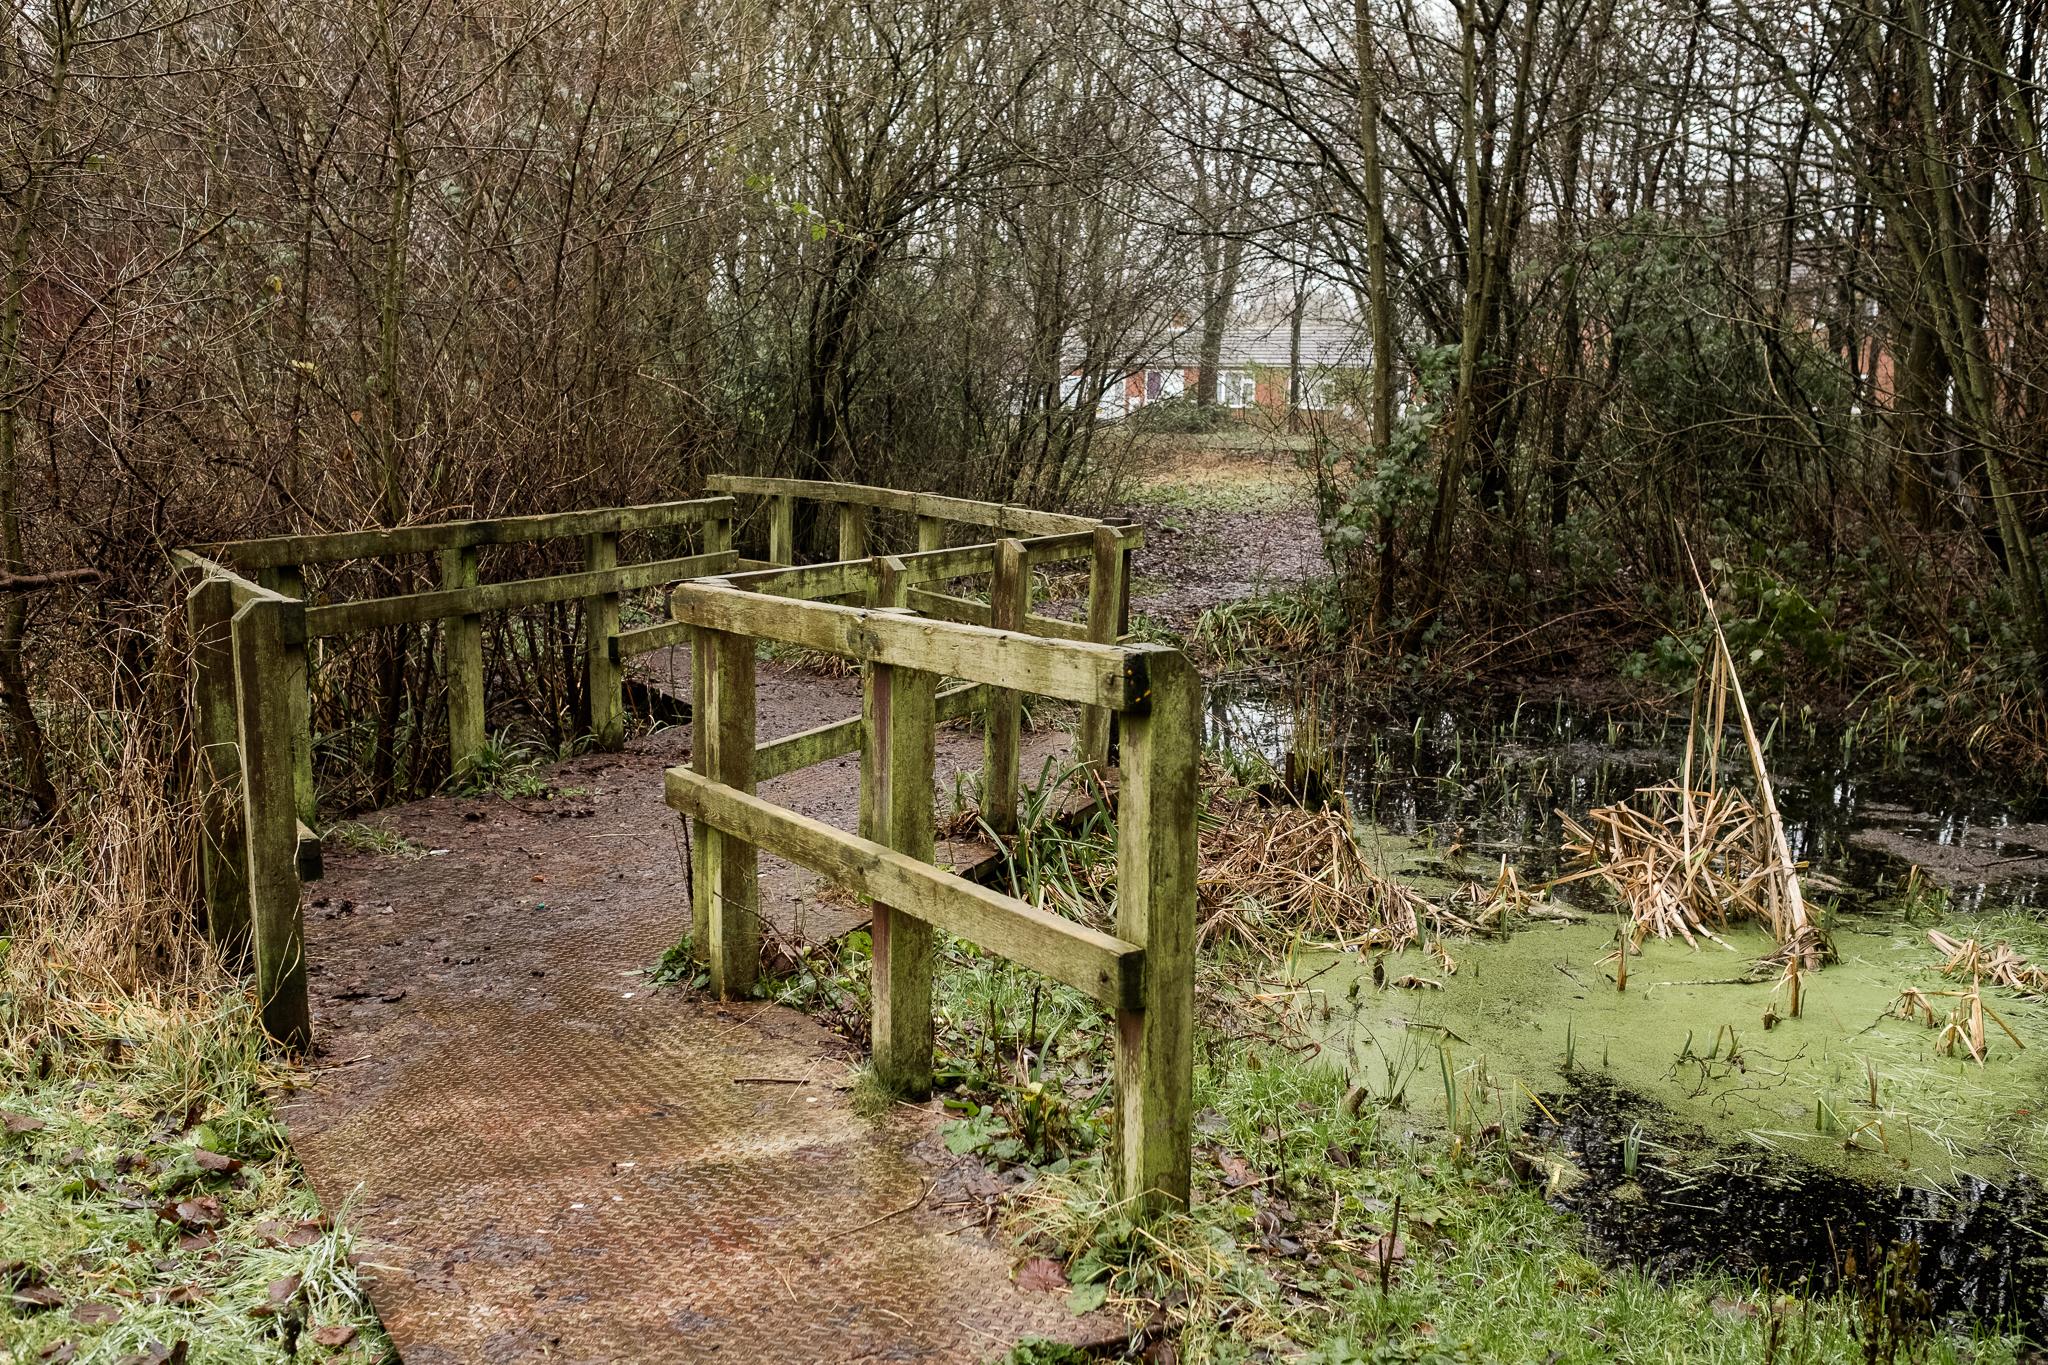 Closer to Home Walk Photowalk Joiner's Square, Hanley, Stoke-on-Trent, Staffordshire Winter Nature Reserve-7.jpg